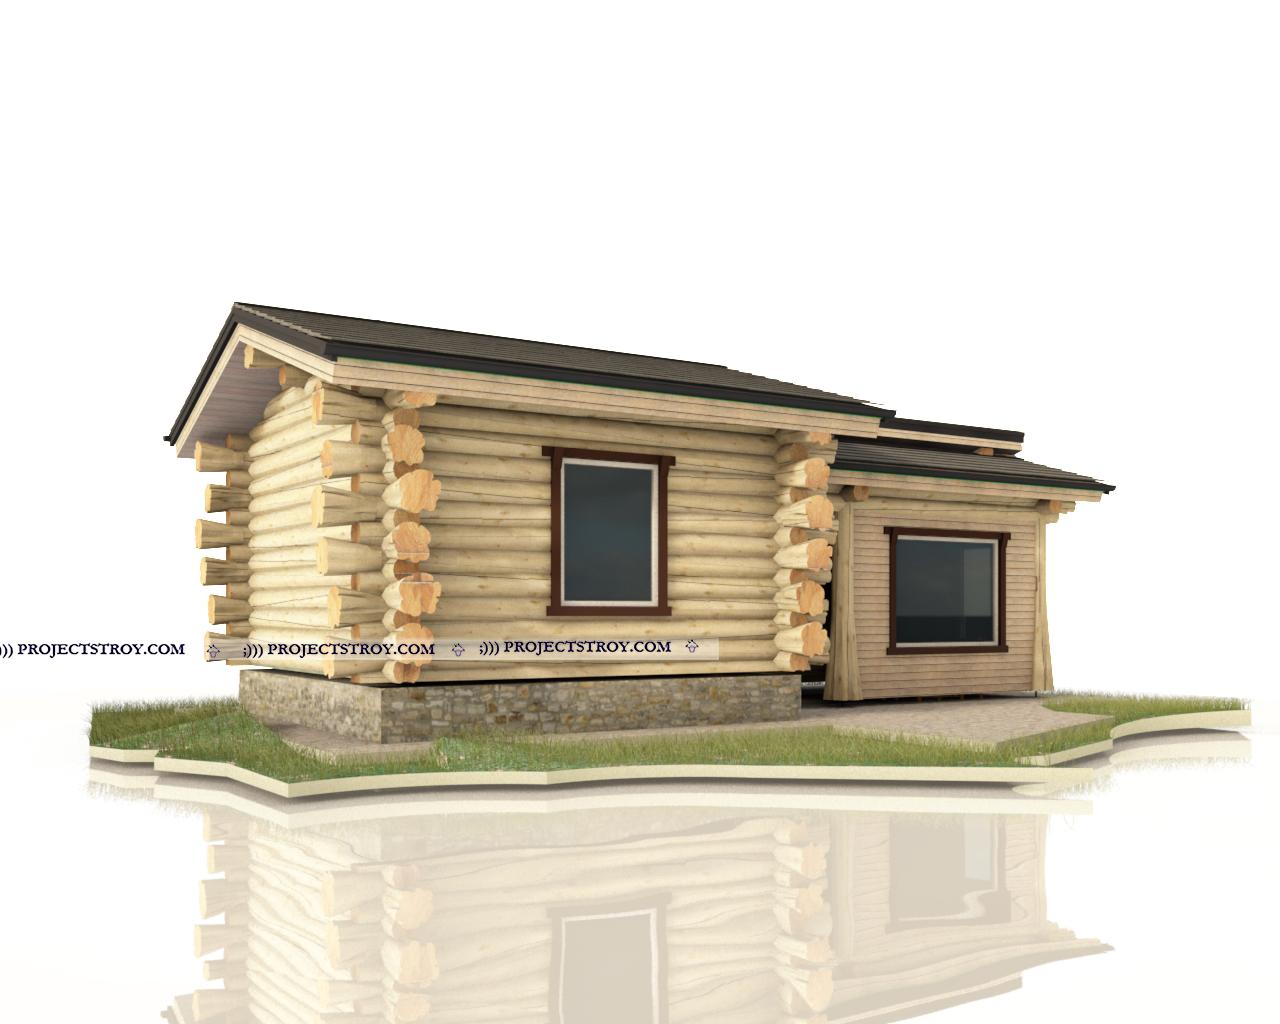 Баня с беседкой или хозпостройкой фасад